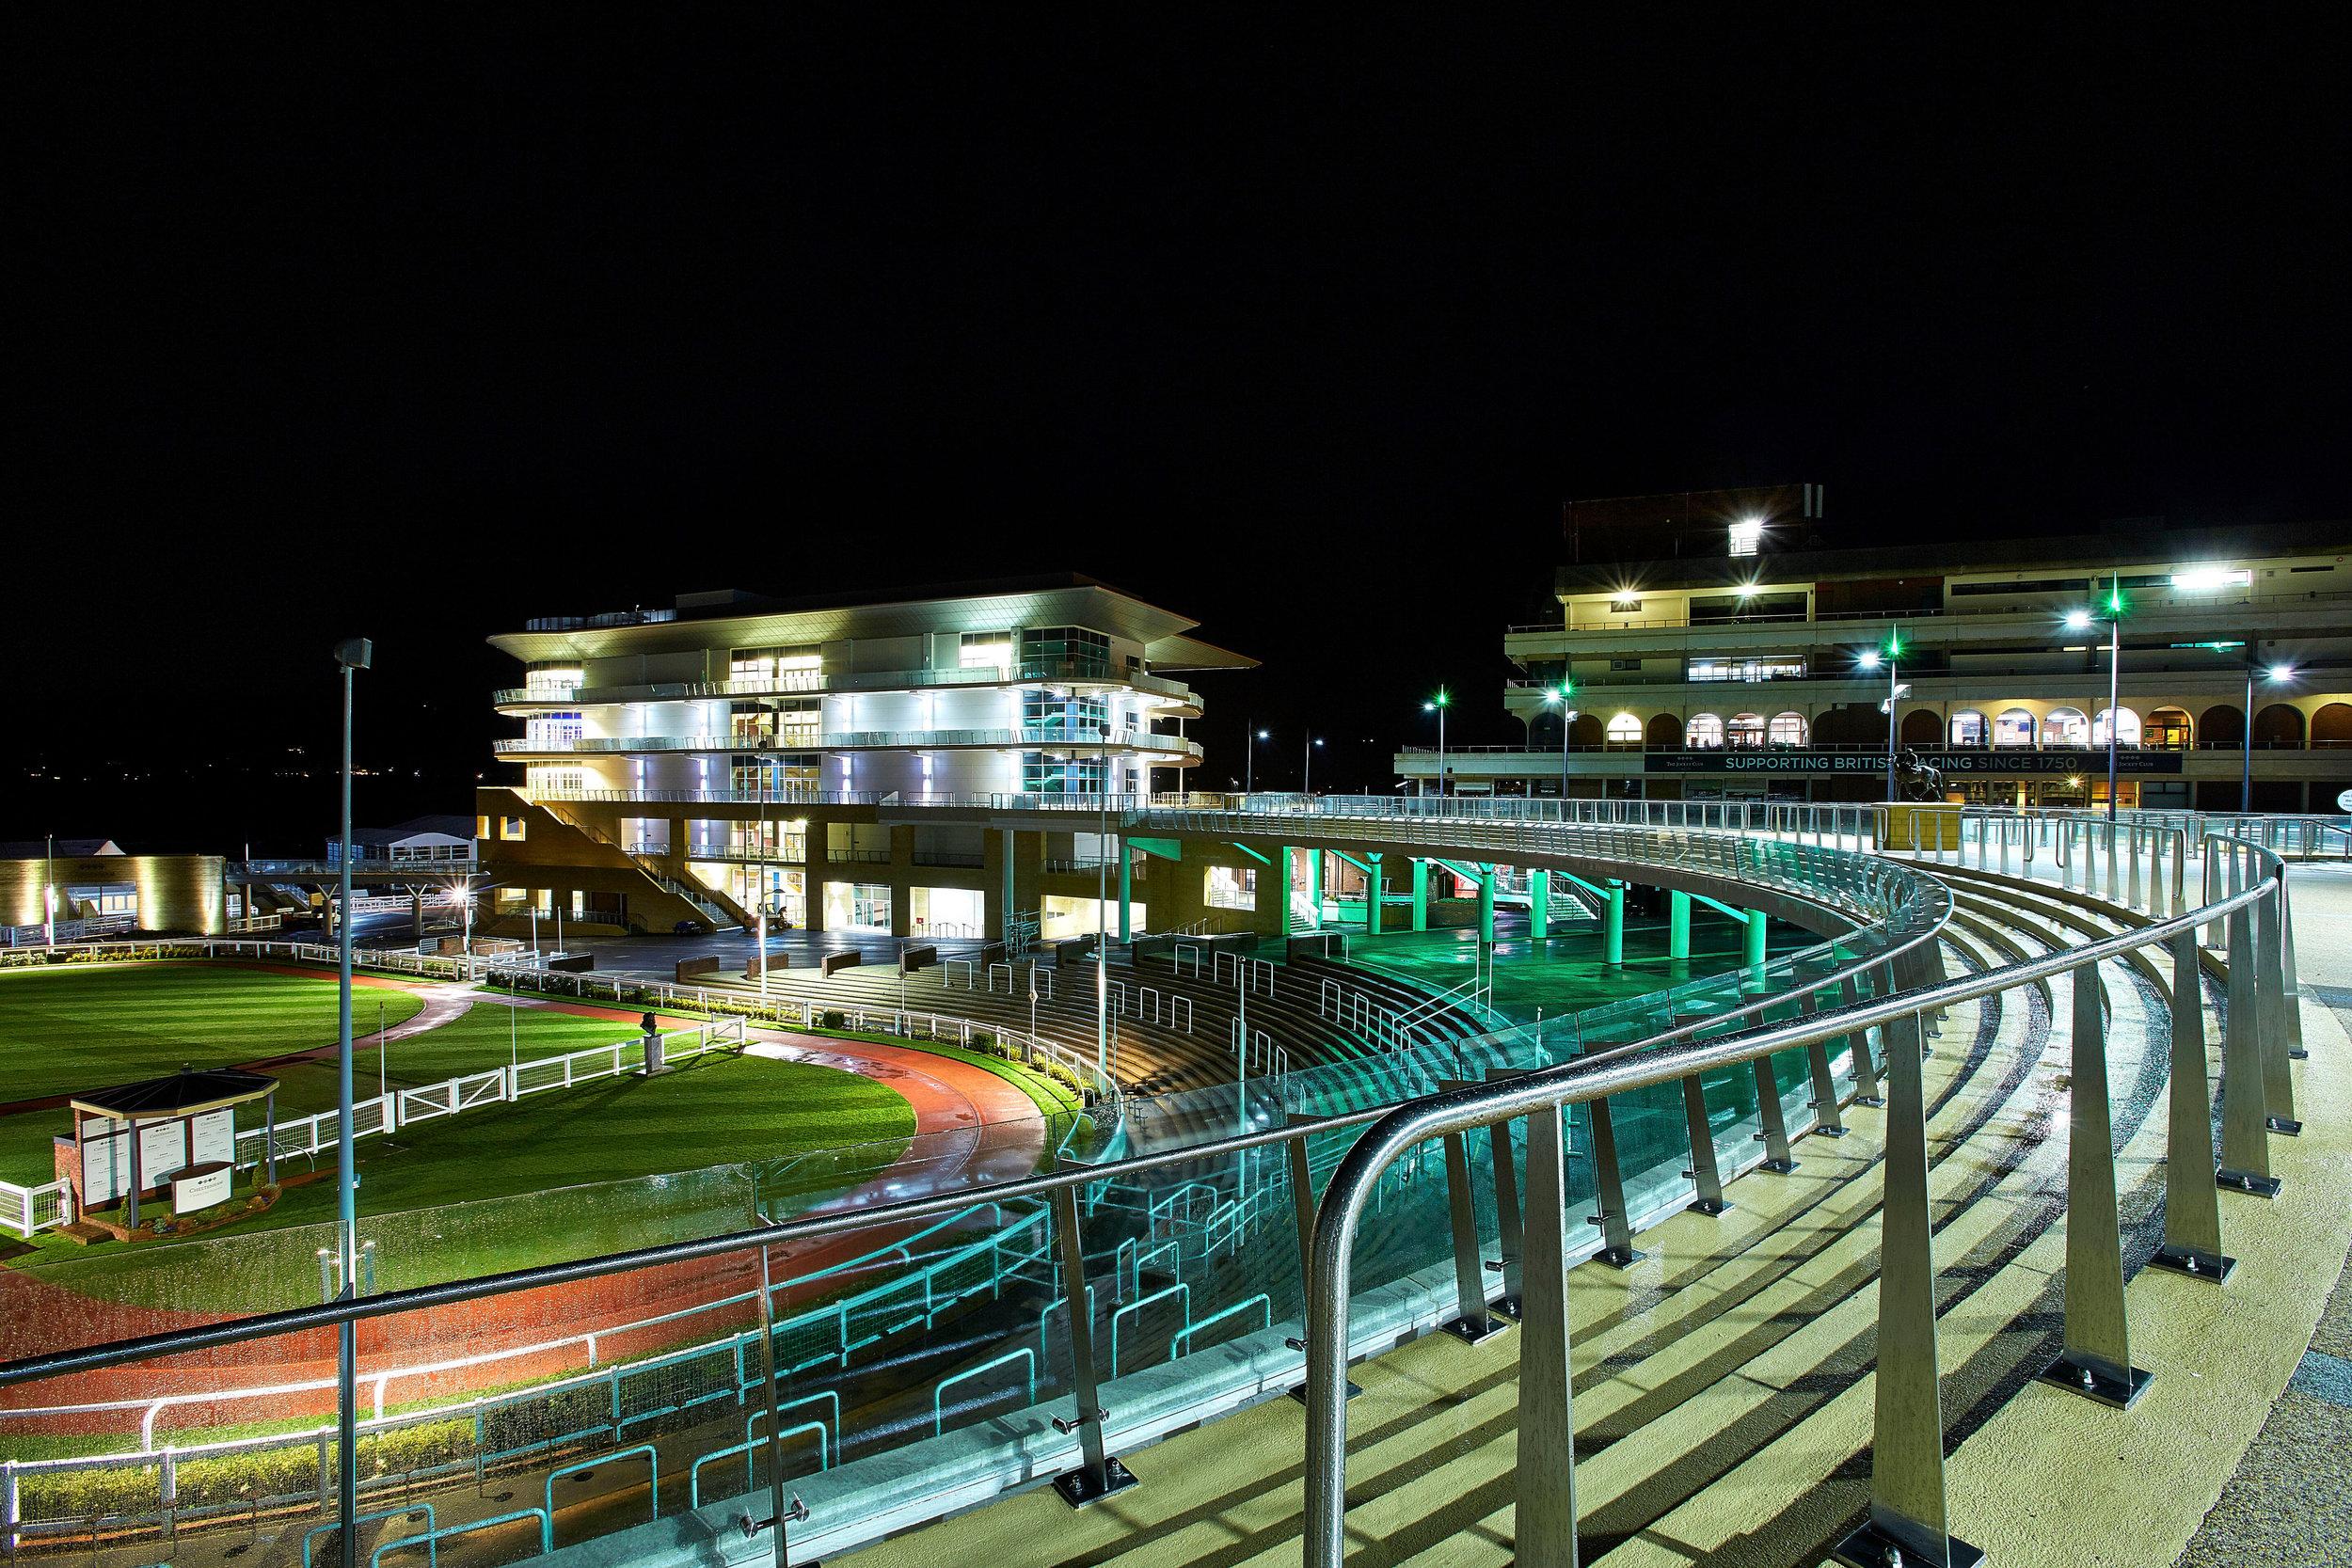 Racecourse #2